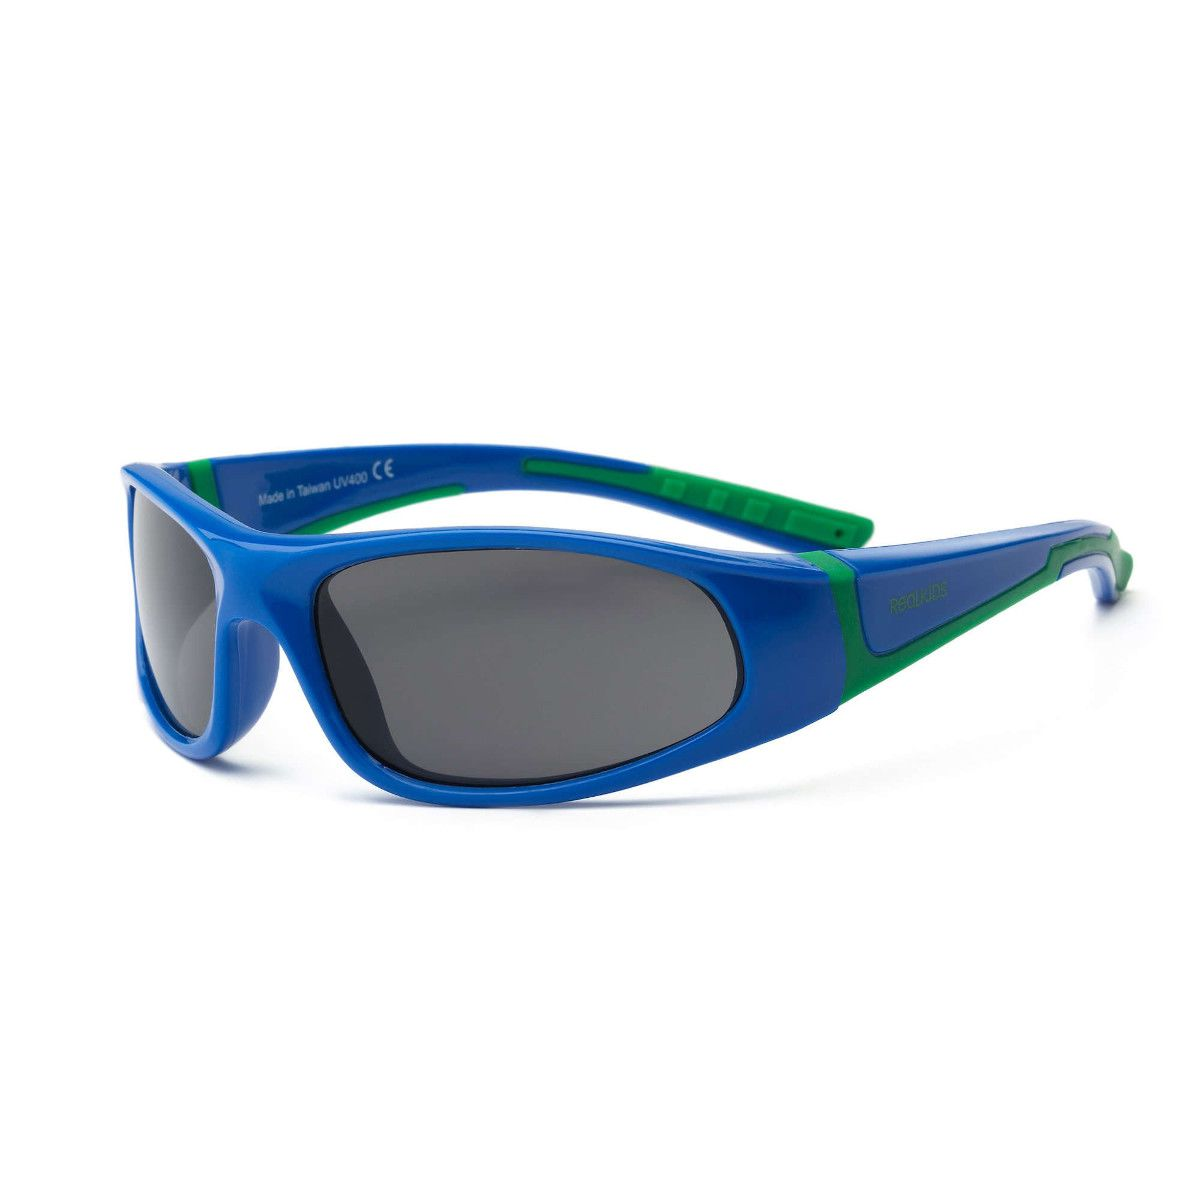 Óculos de Sol Bolt Azul e Verde Real Shades